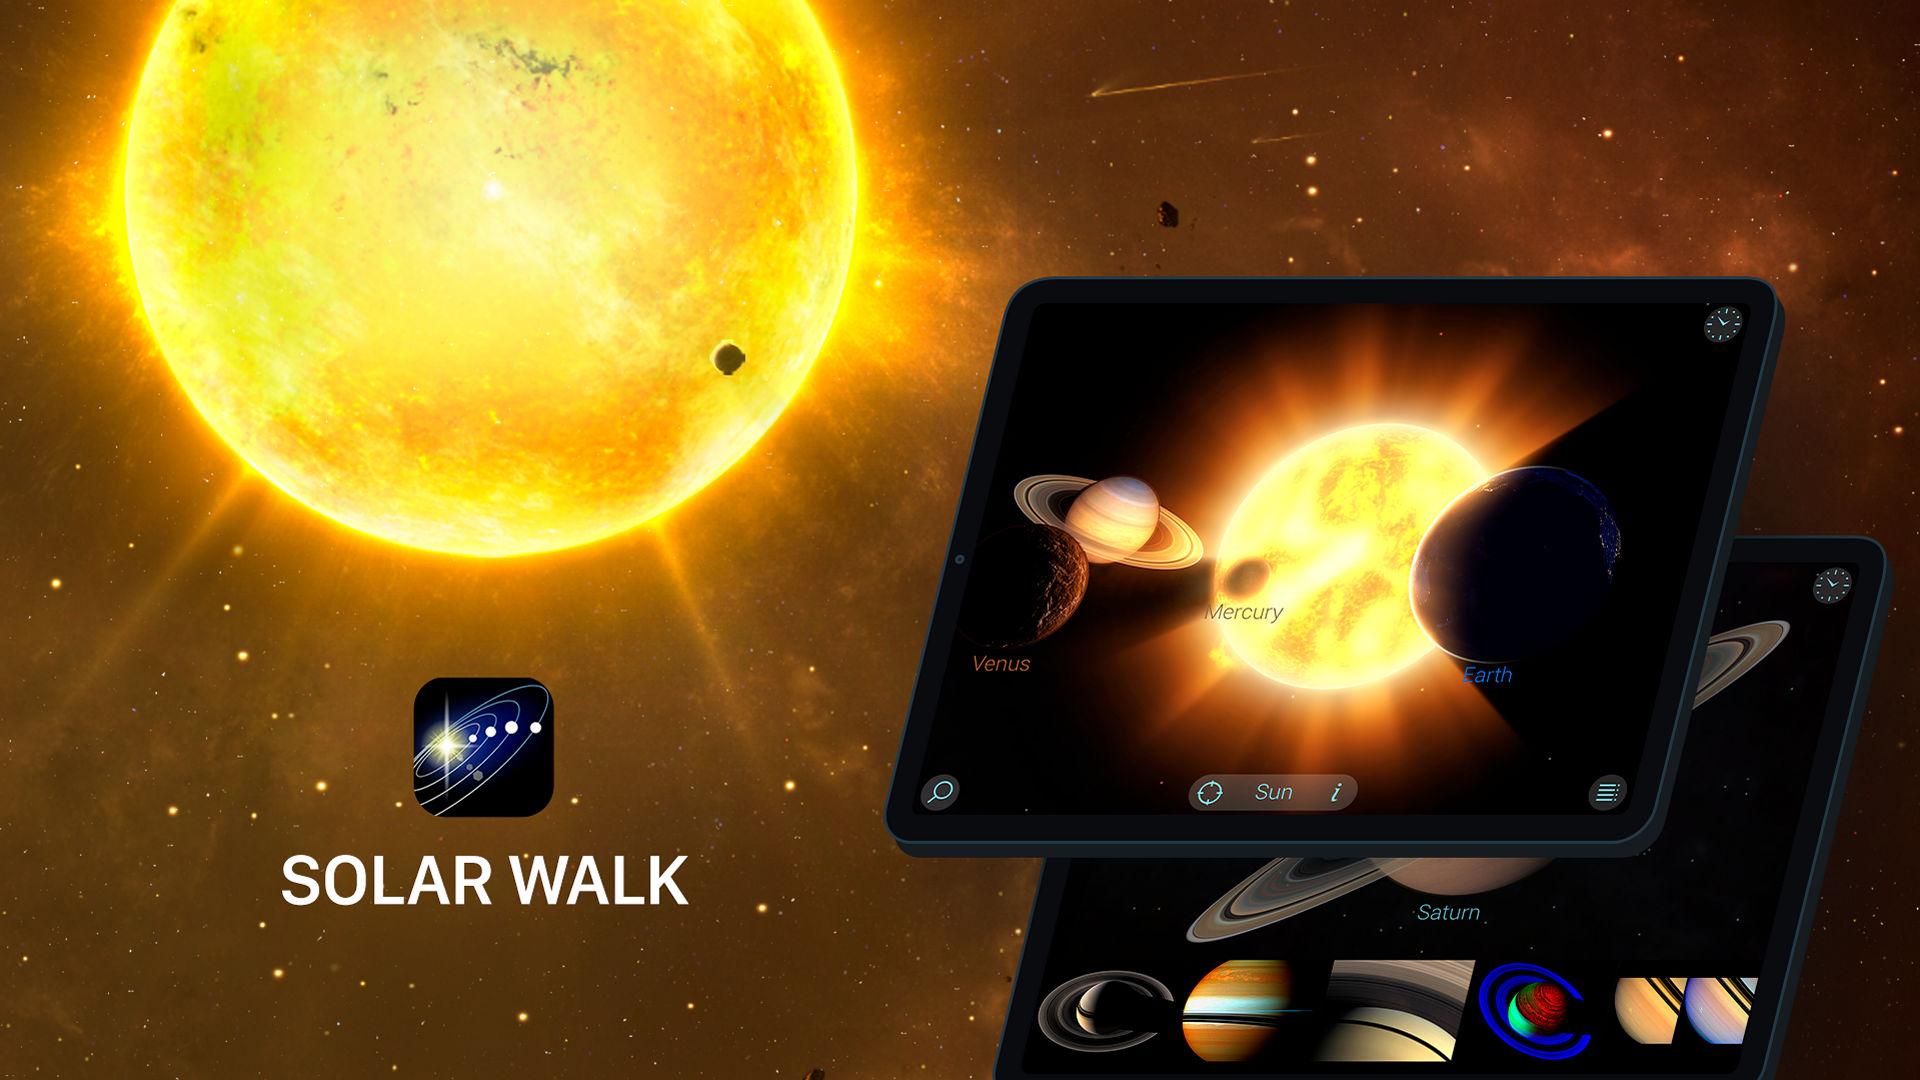 Solar Walk app